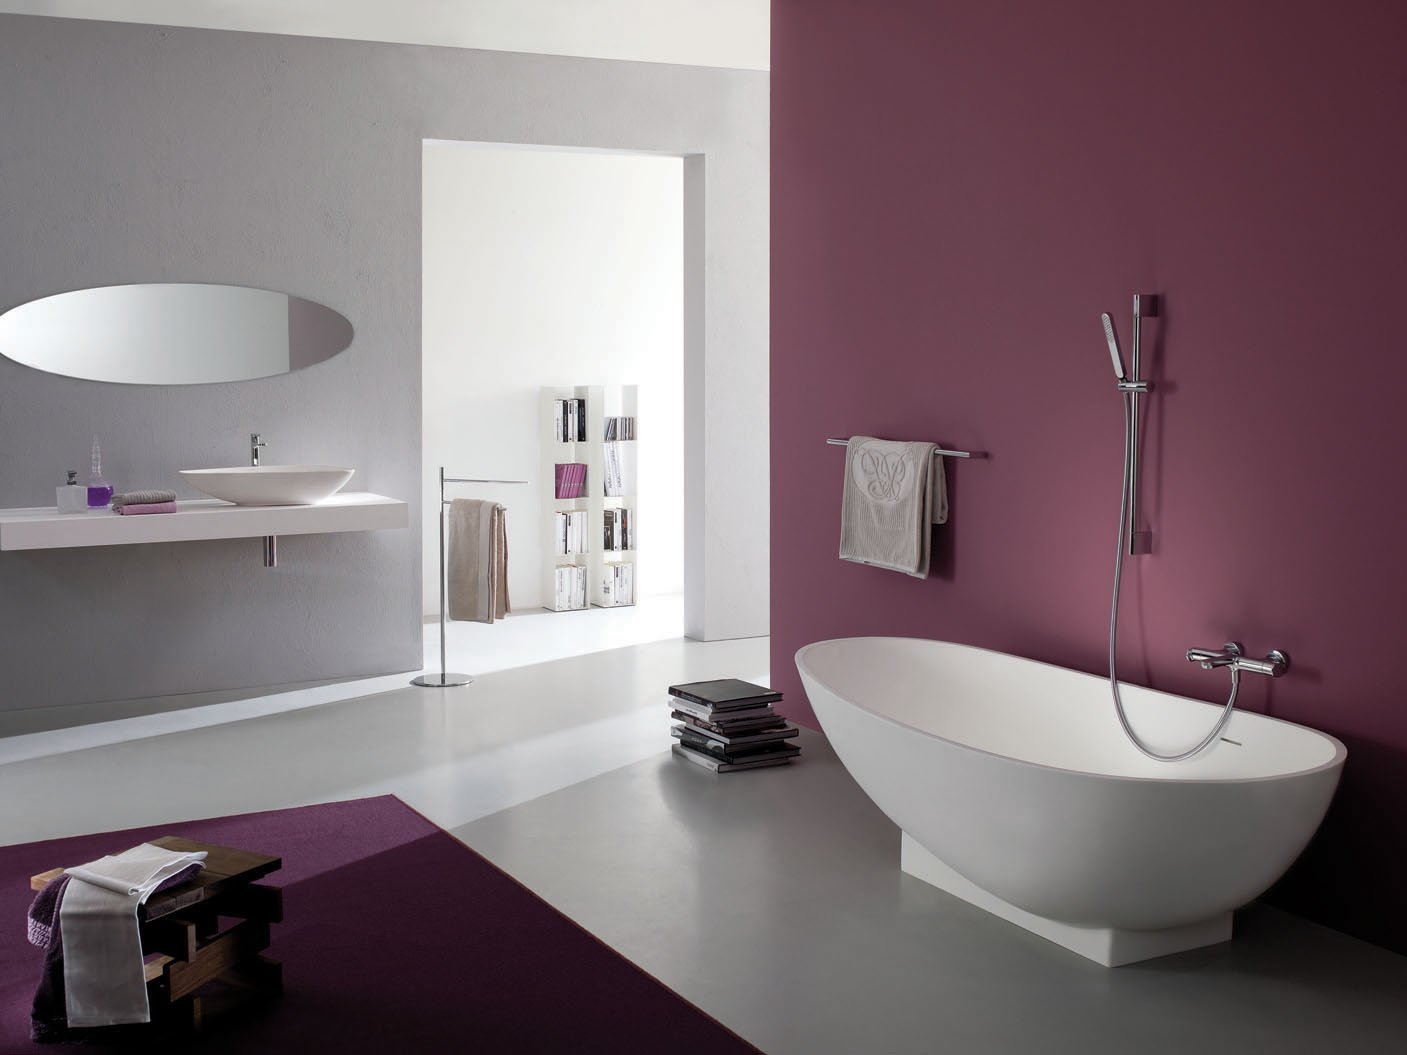 Lineaviva la linea bagno dallo stile elegante e raffinato - Sanitari bagno ikea ...